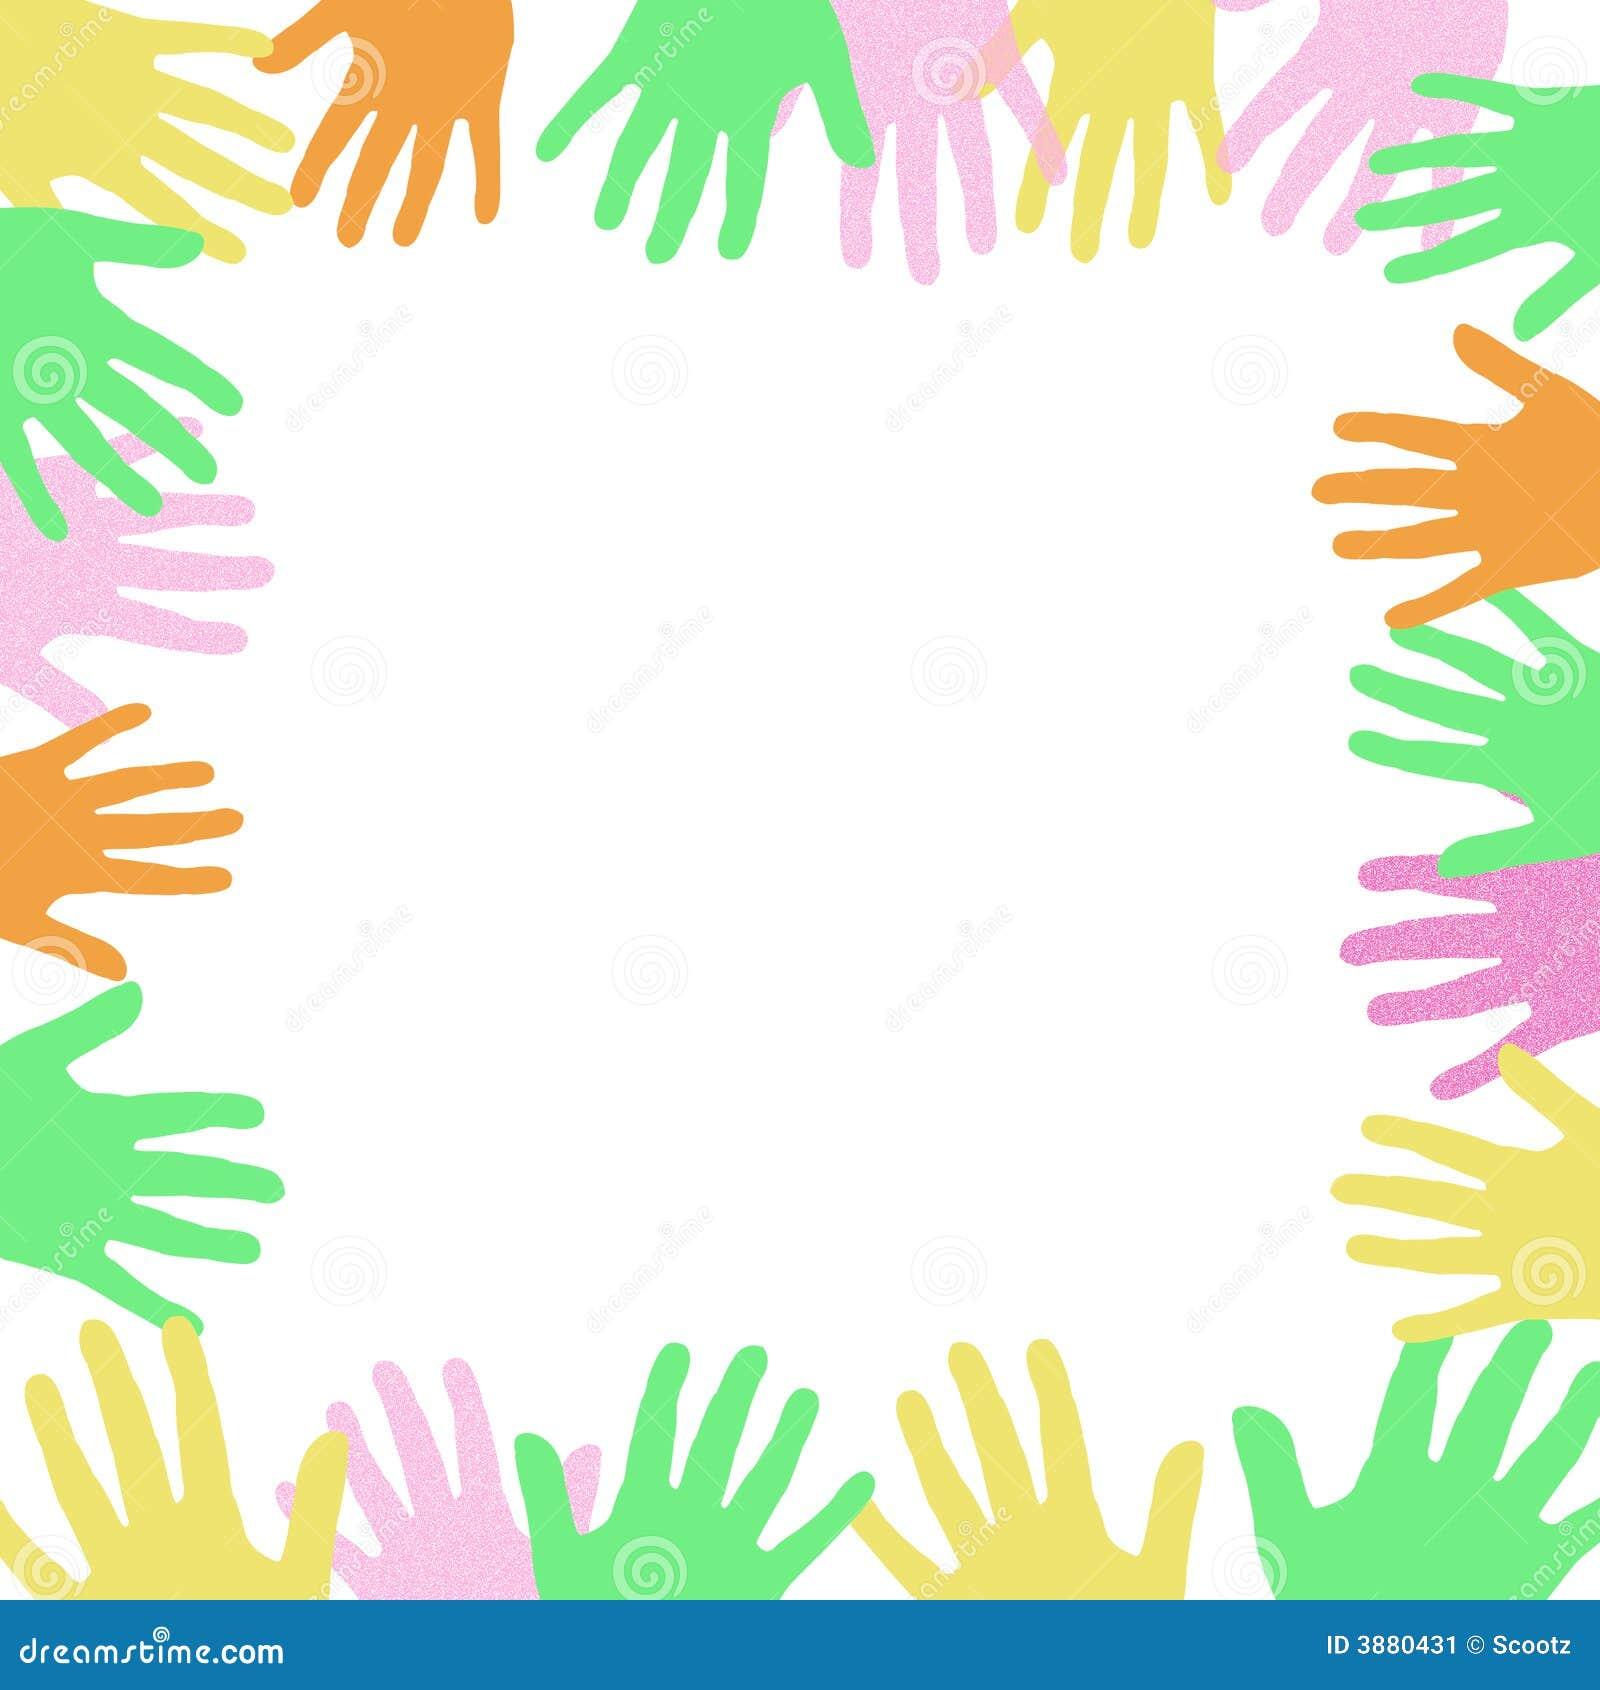 Volunteer sign stock image image 3880431